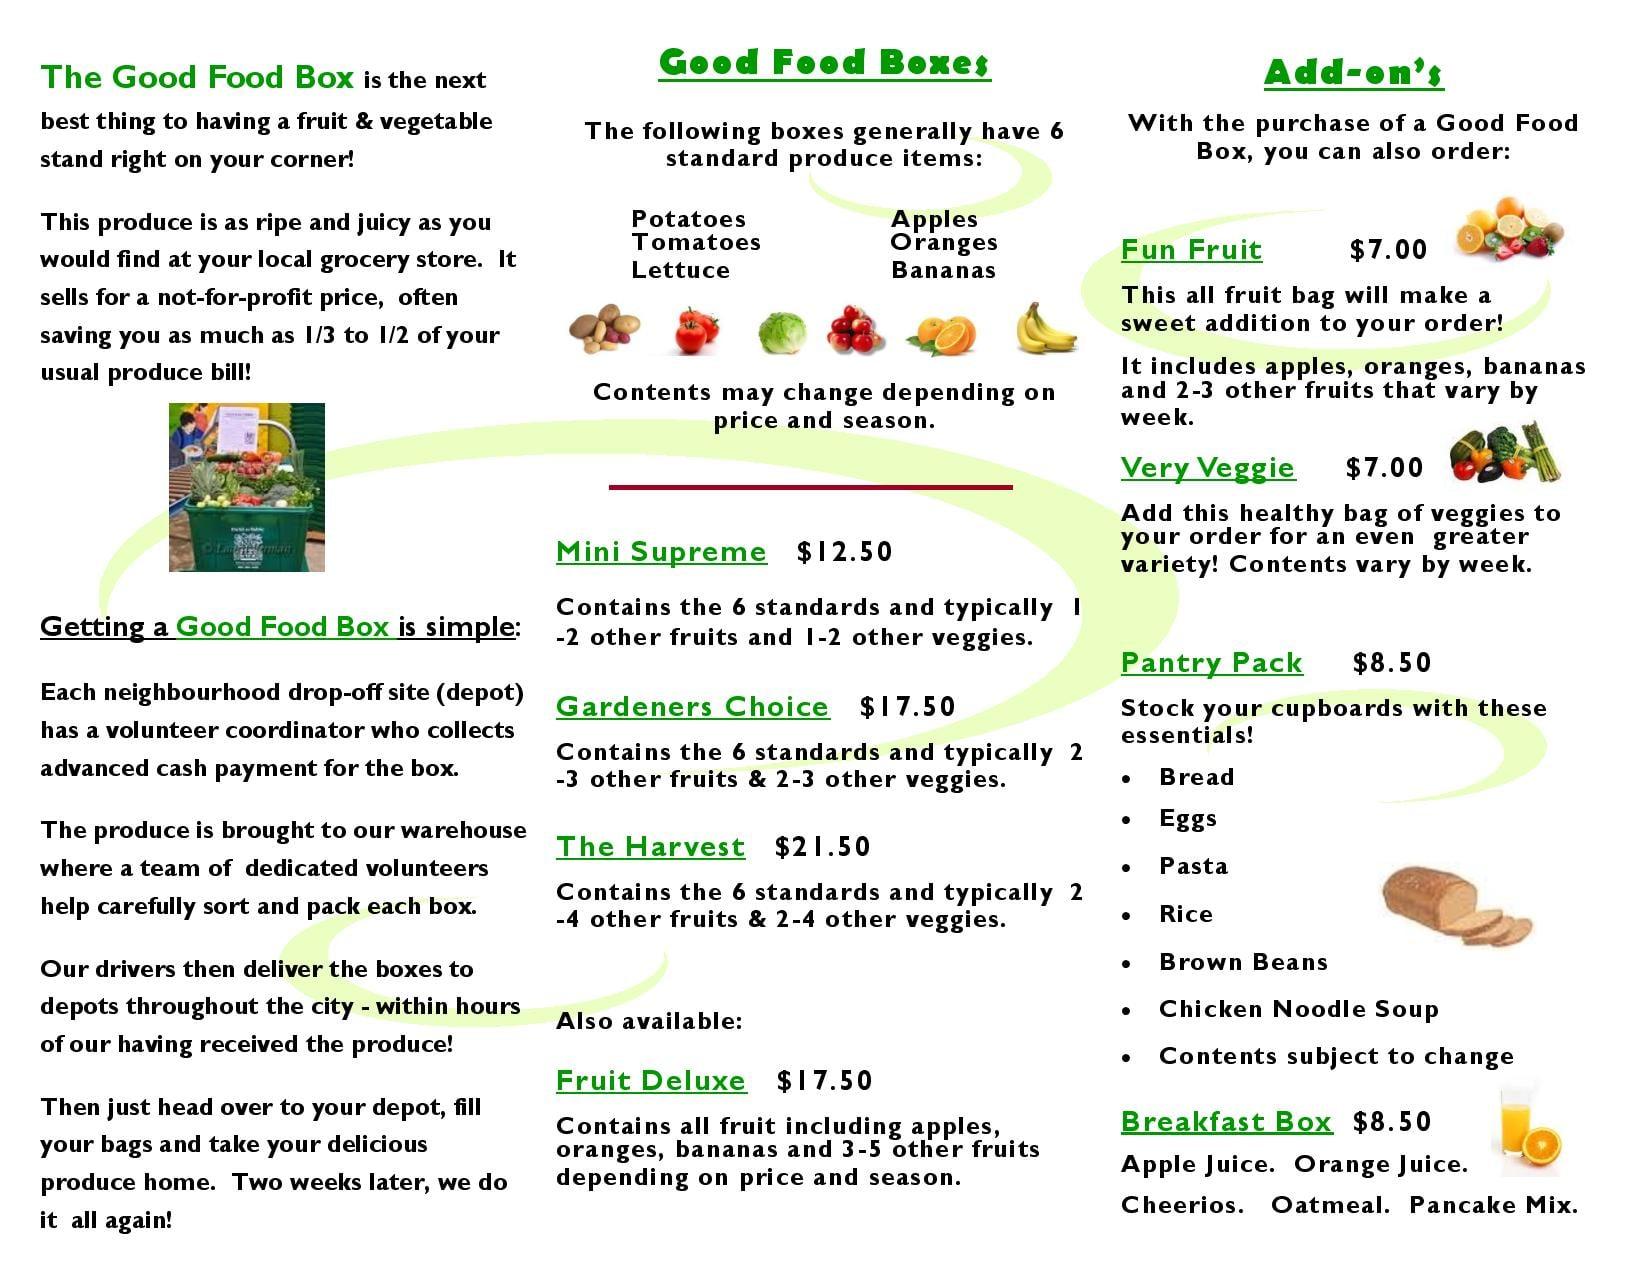 GOOD FOOD BOX - Image 2